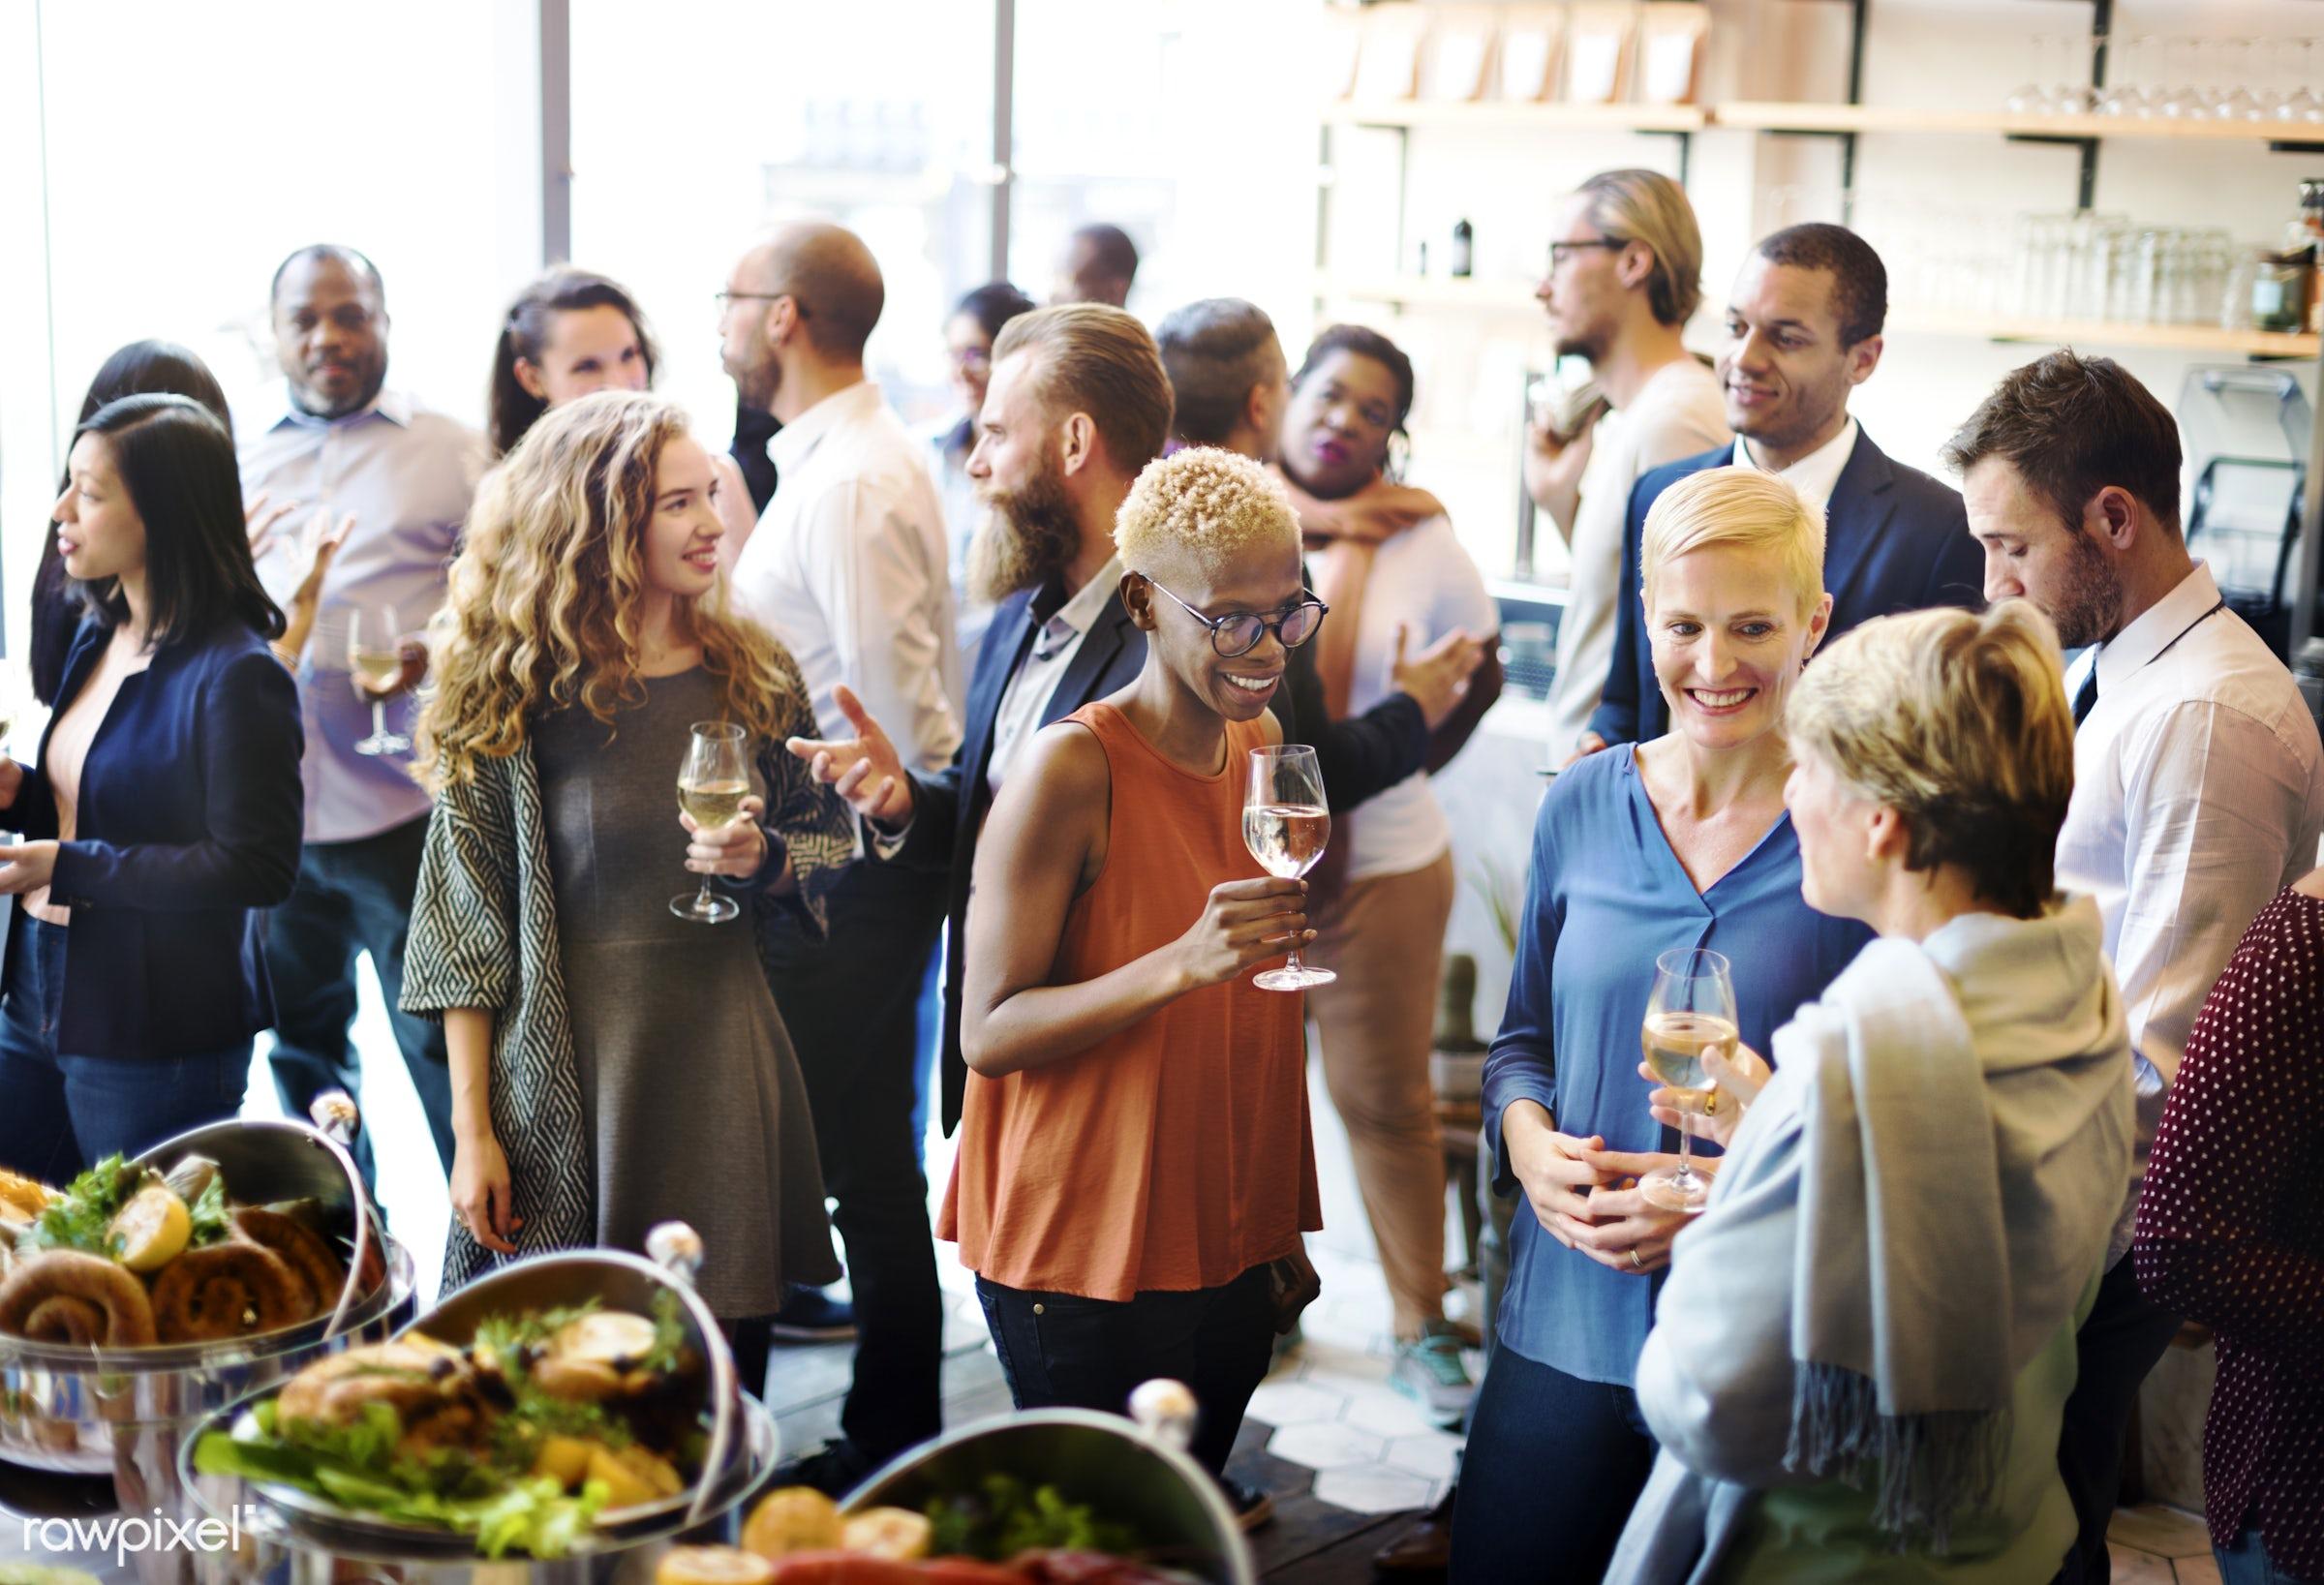 asian food, brunch, buffet, cafe, celebration, crowd, dessert, diet, dining, dinner, diversity, drinking, eat, eating,...